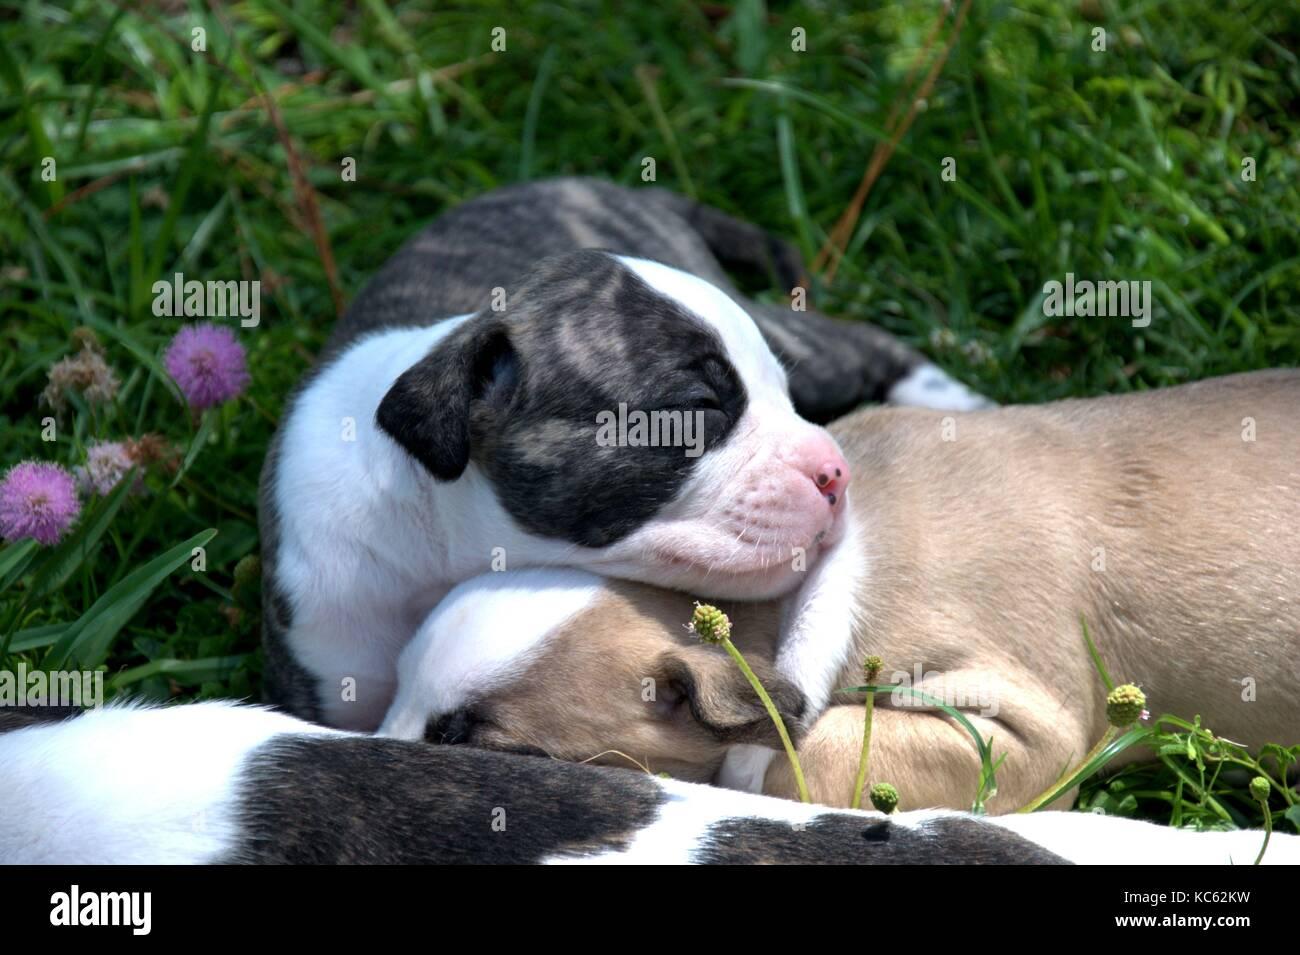 Sleeping American Bulldog puppies. - Stock Image